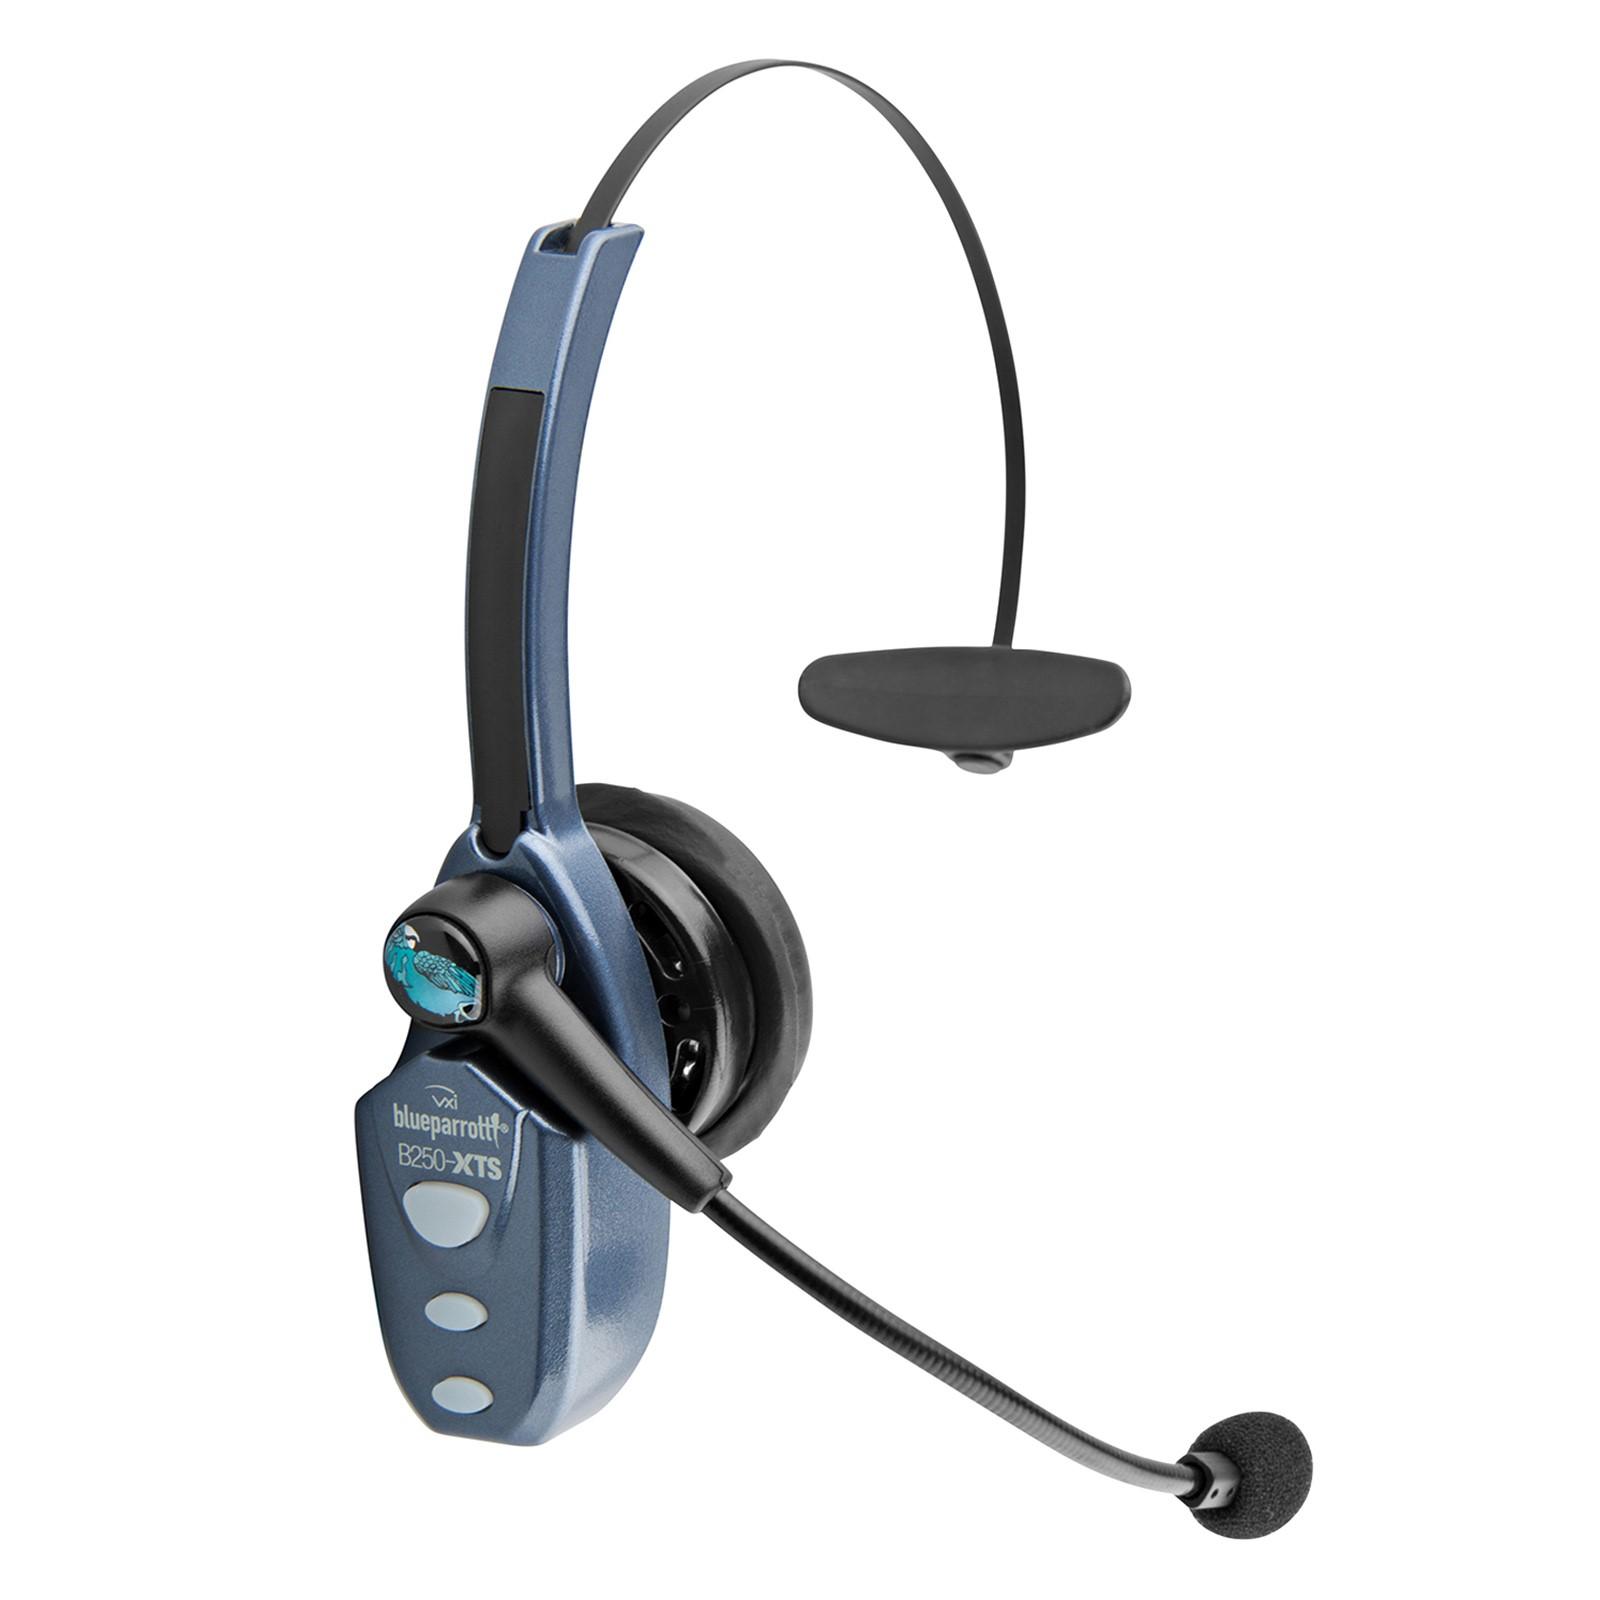 VXI BlueParrott B250-XTS Bluetooth Headset Black (Certified Refurbished) by VXi BlueParrott